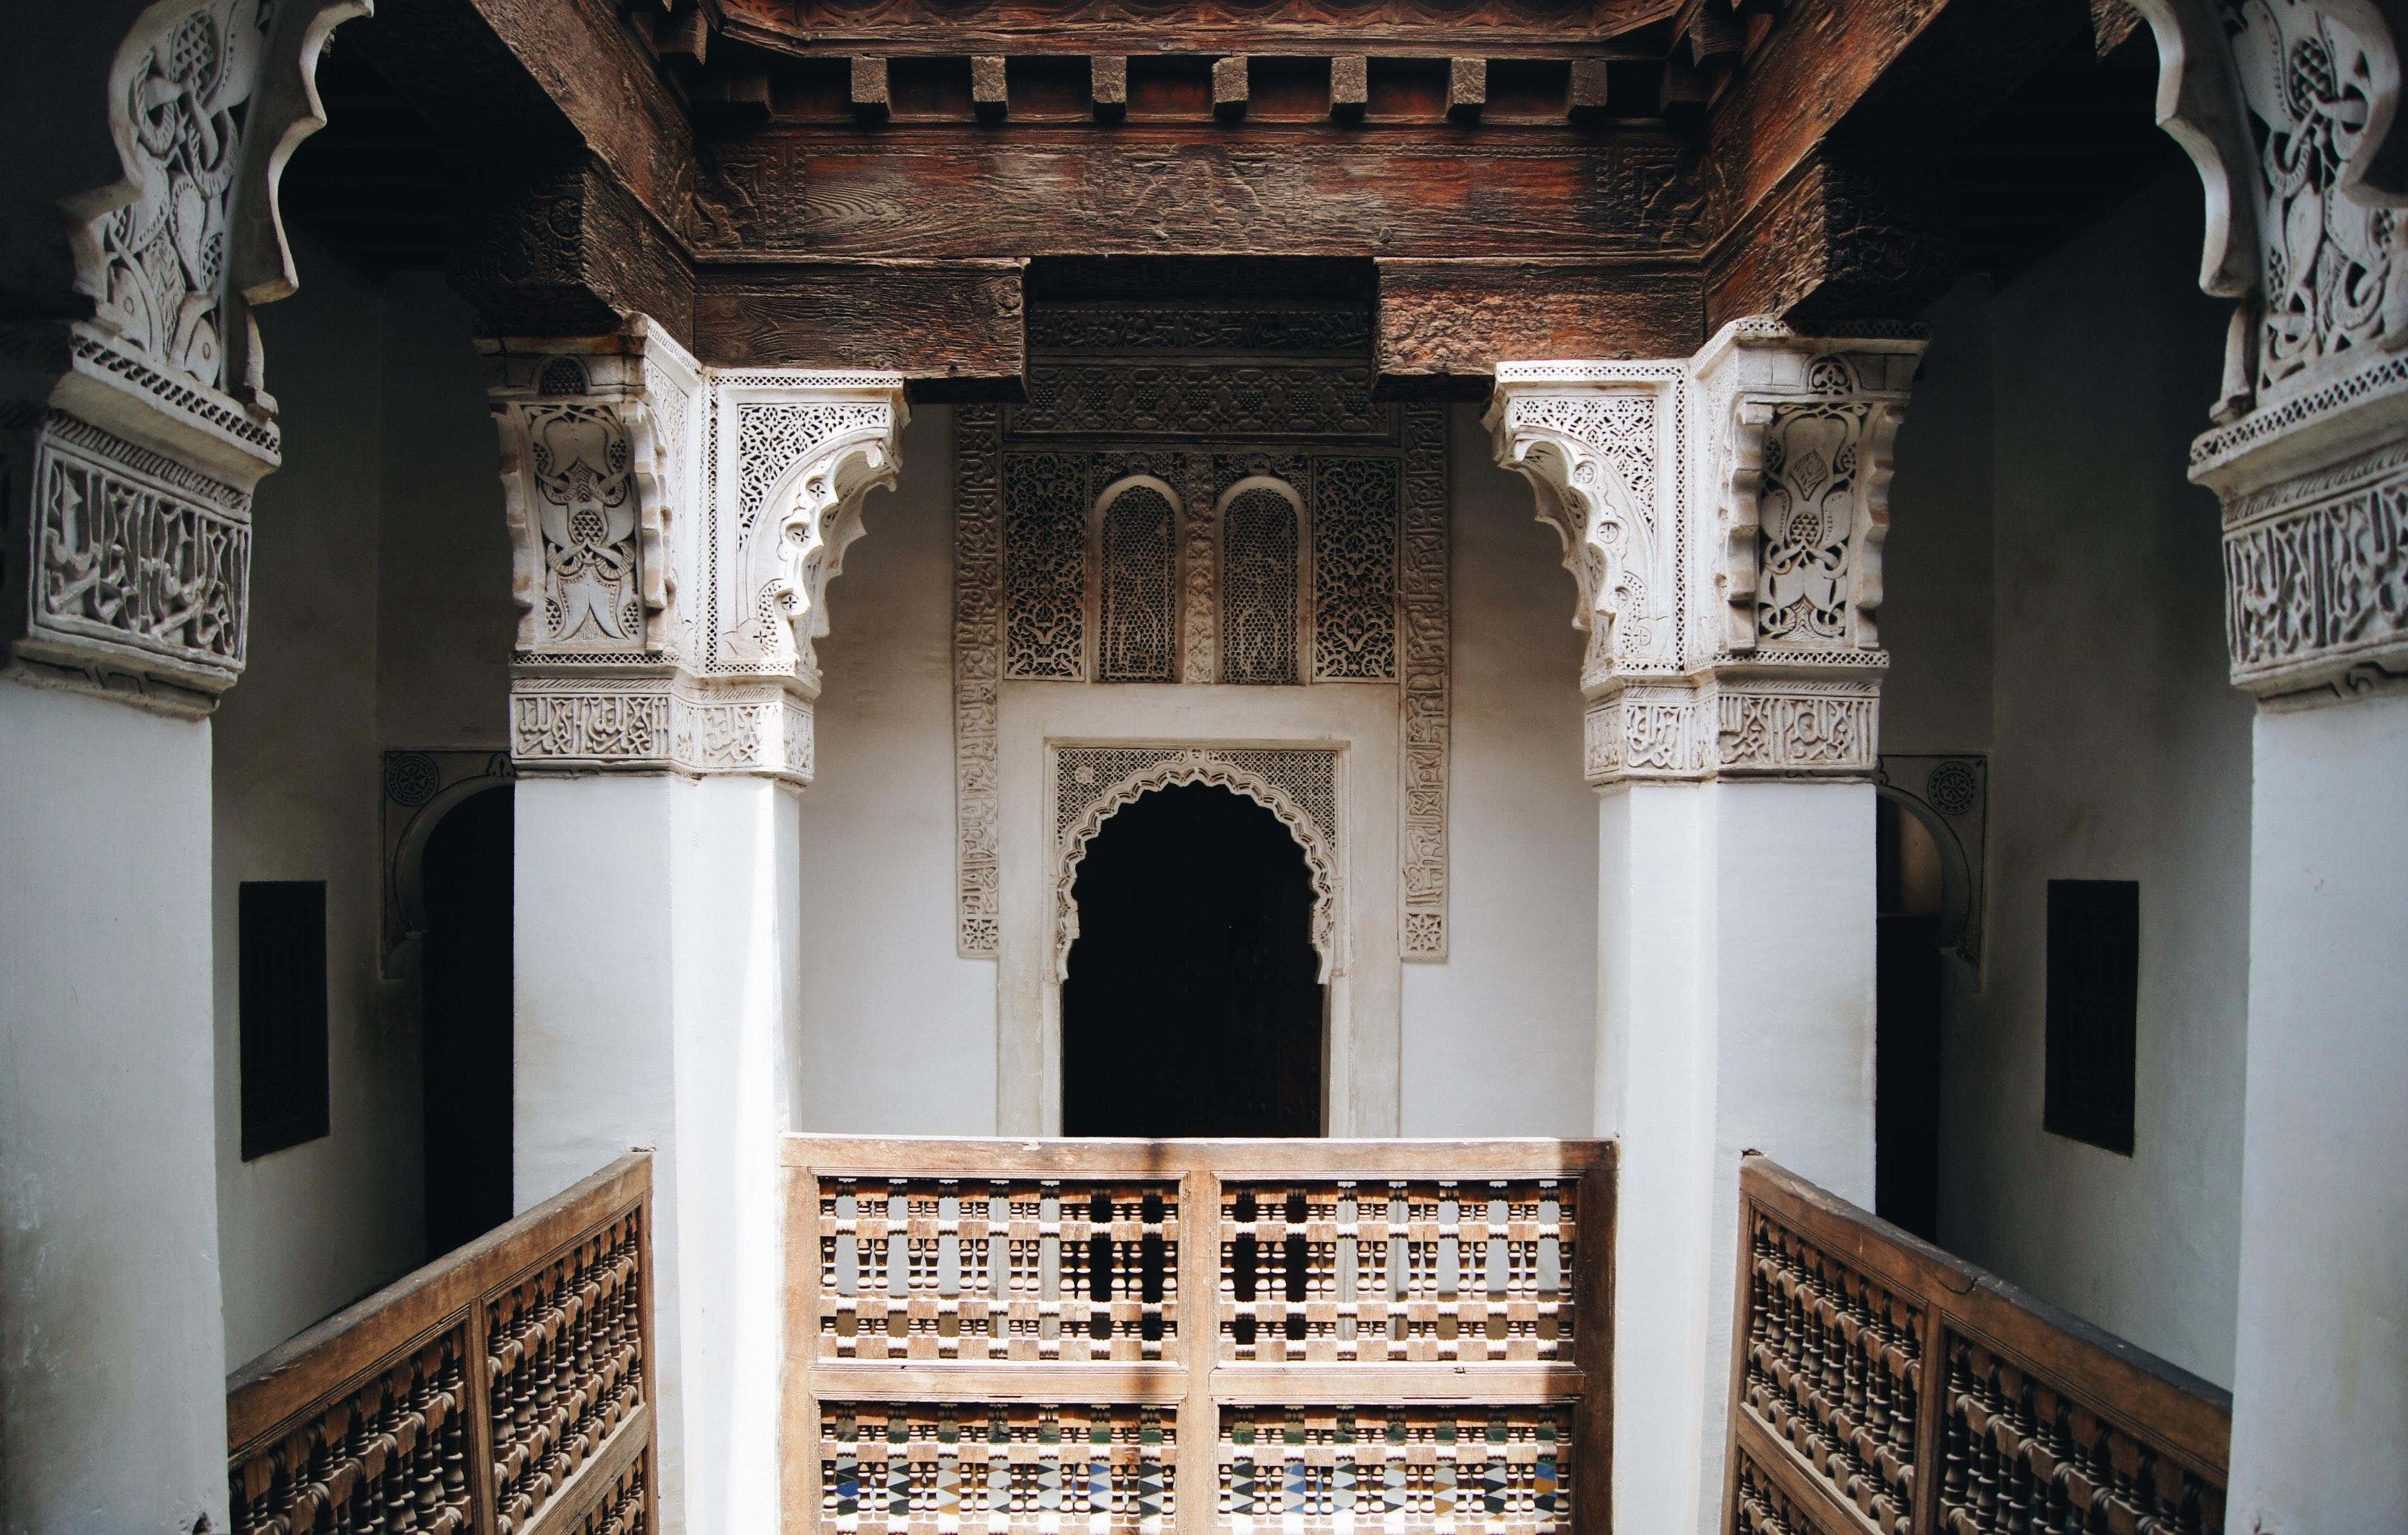 Is Morocco Marrakech safe?